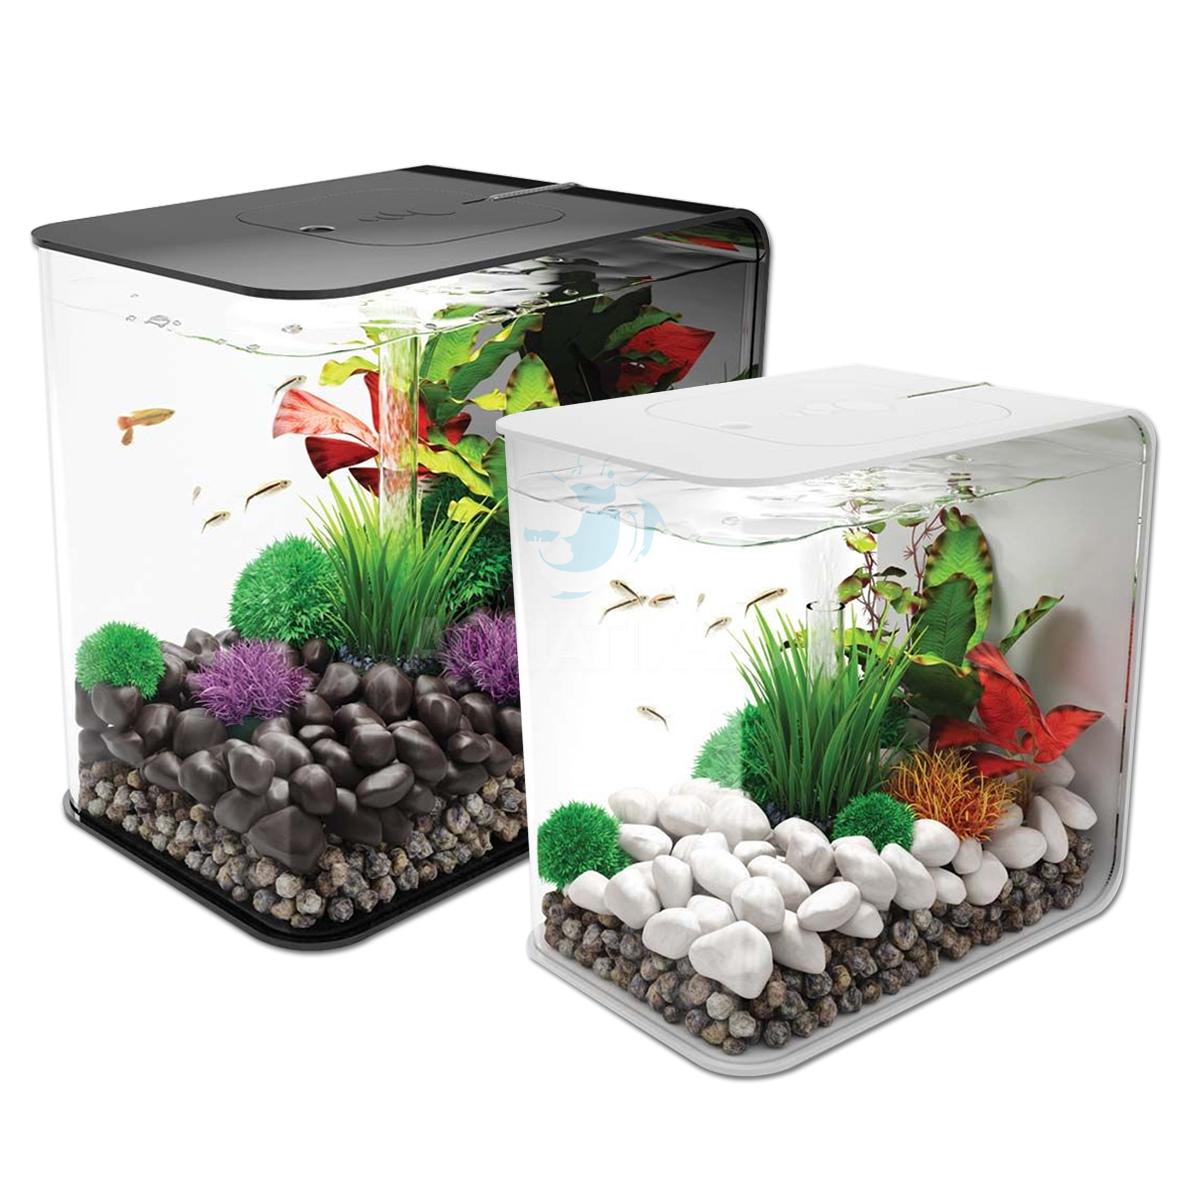 Biorb flow aquarium all in one fish tank kit with filter for Fish tank kits